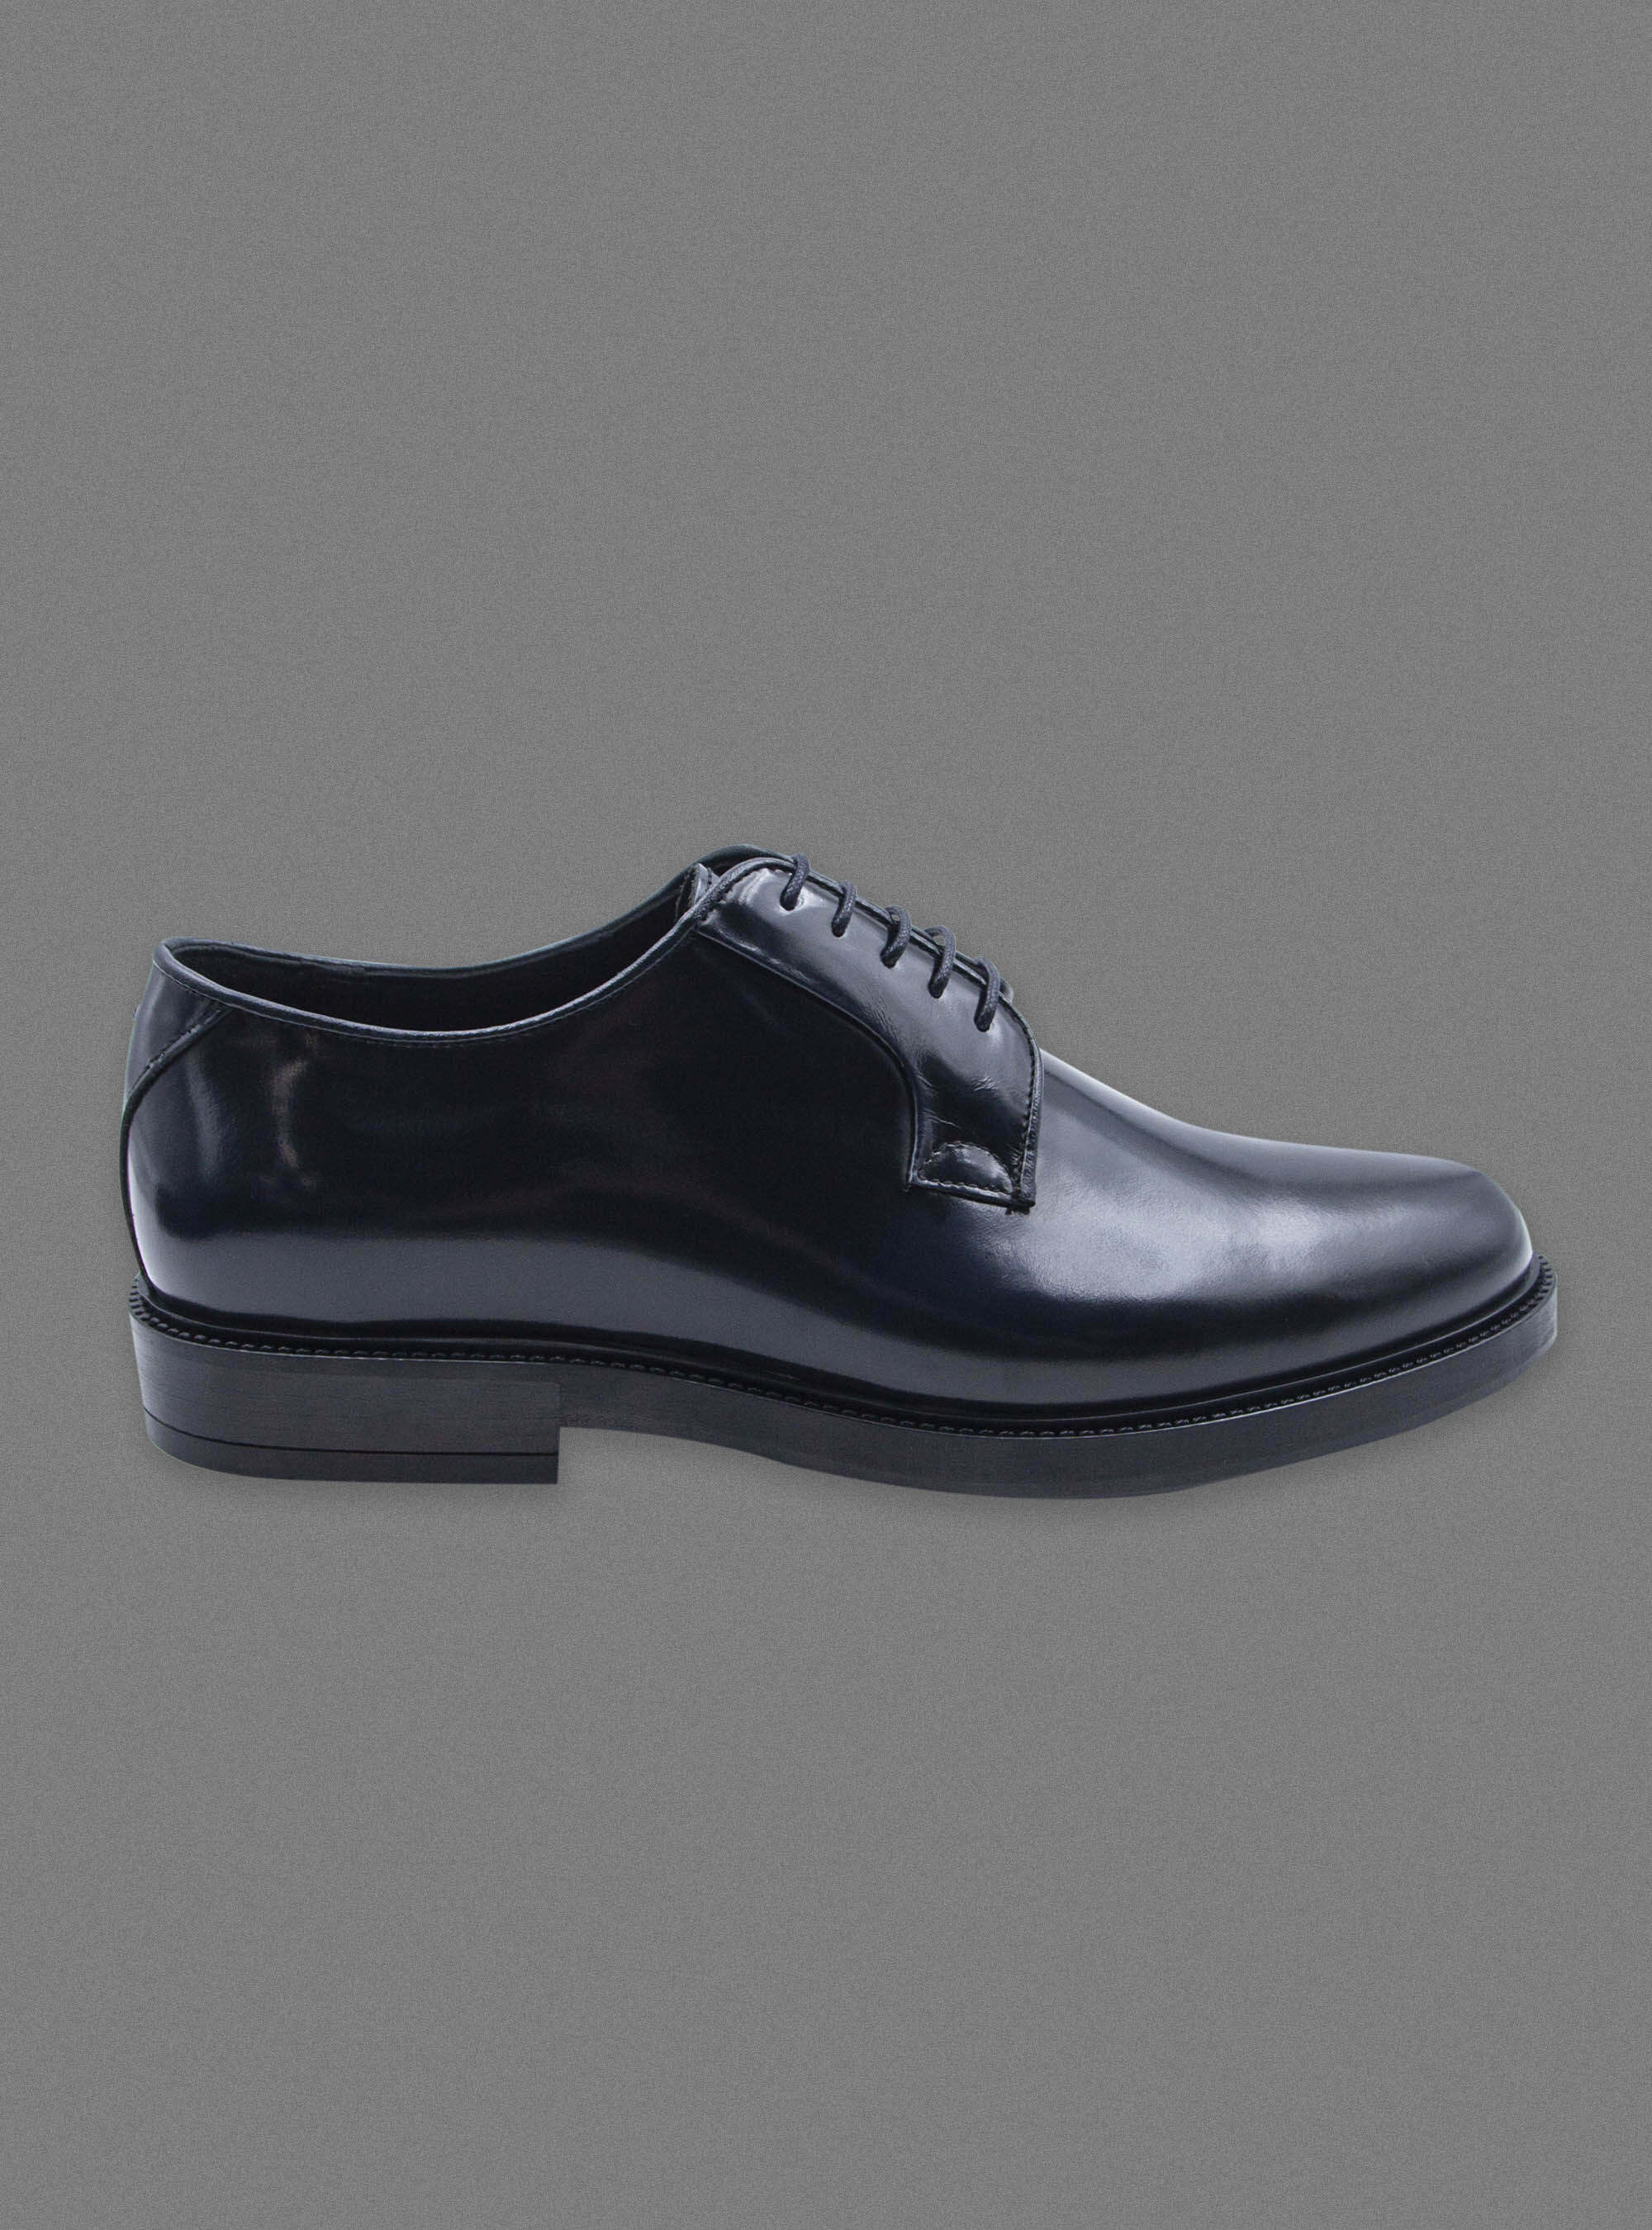 Calzature per Uomo: Scarpe Casual e Eleganti | Gutteridge